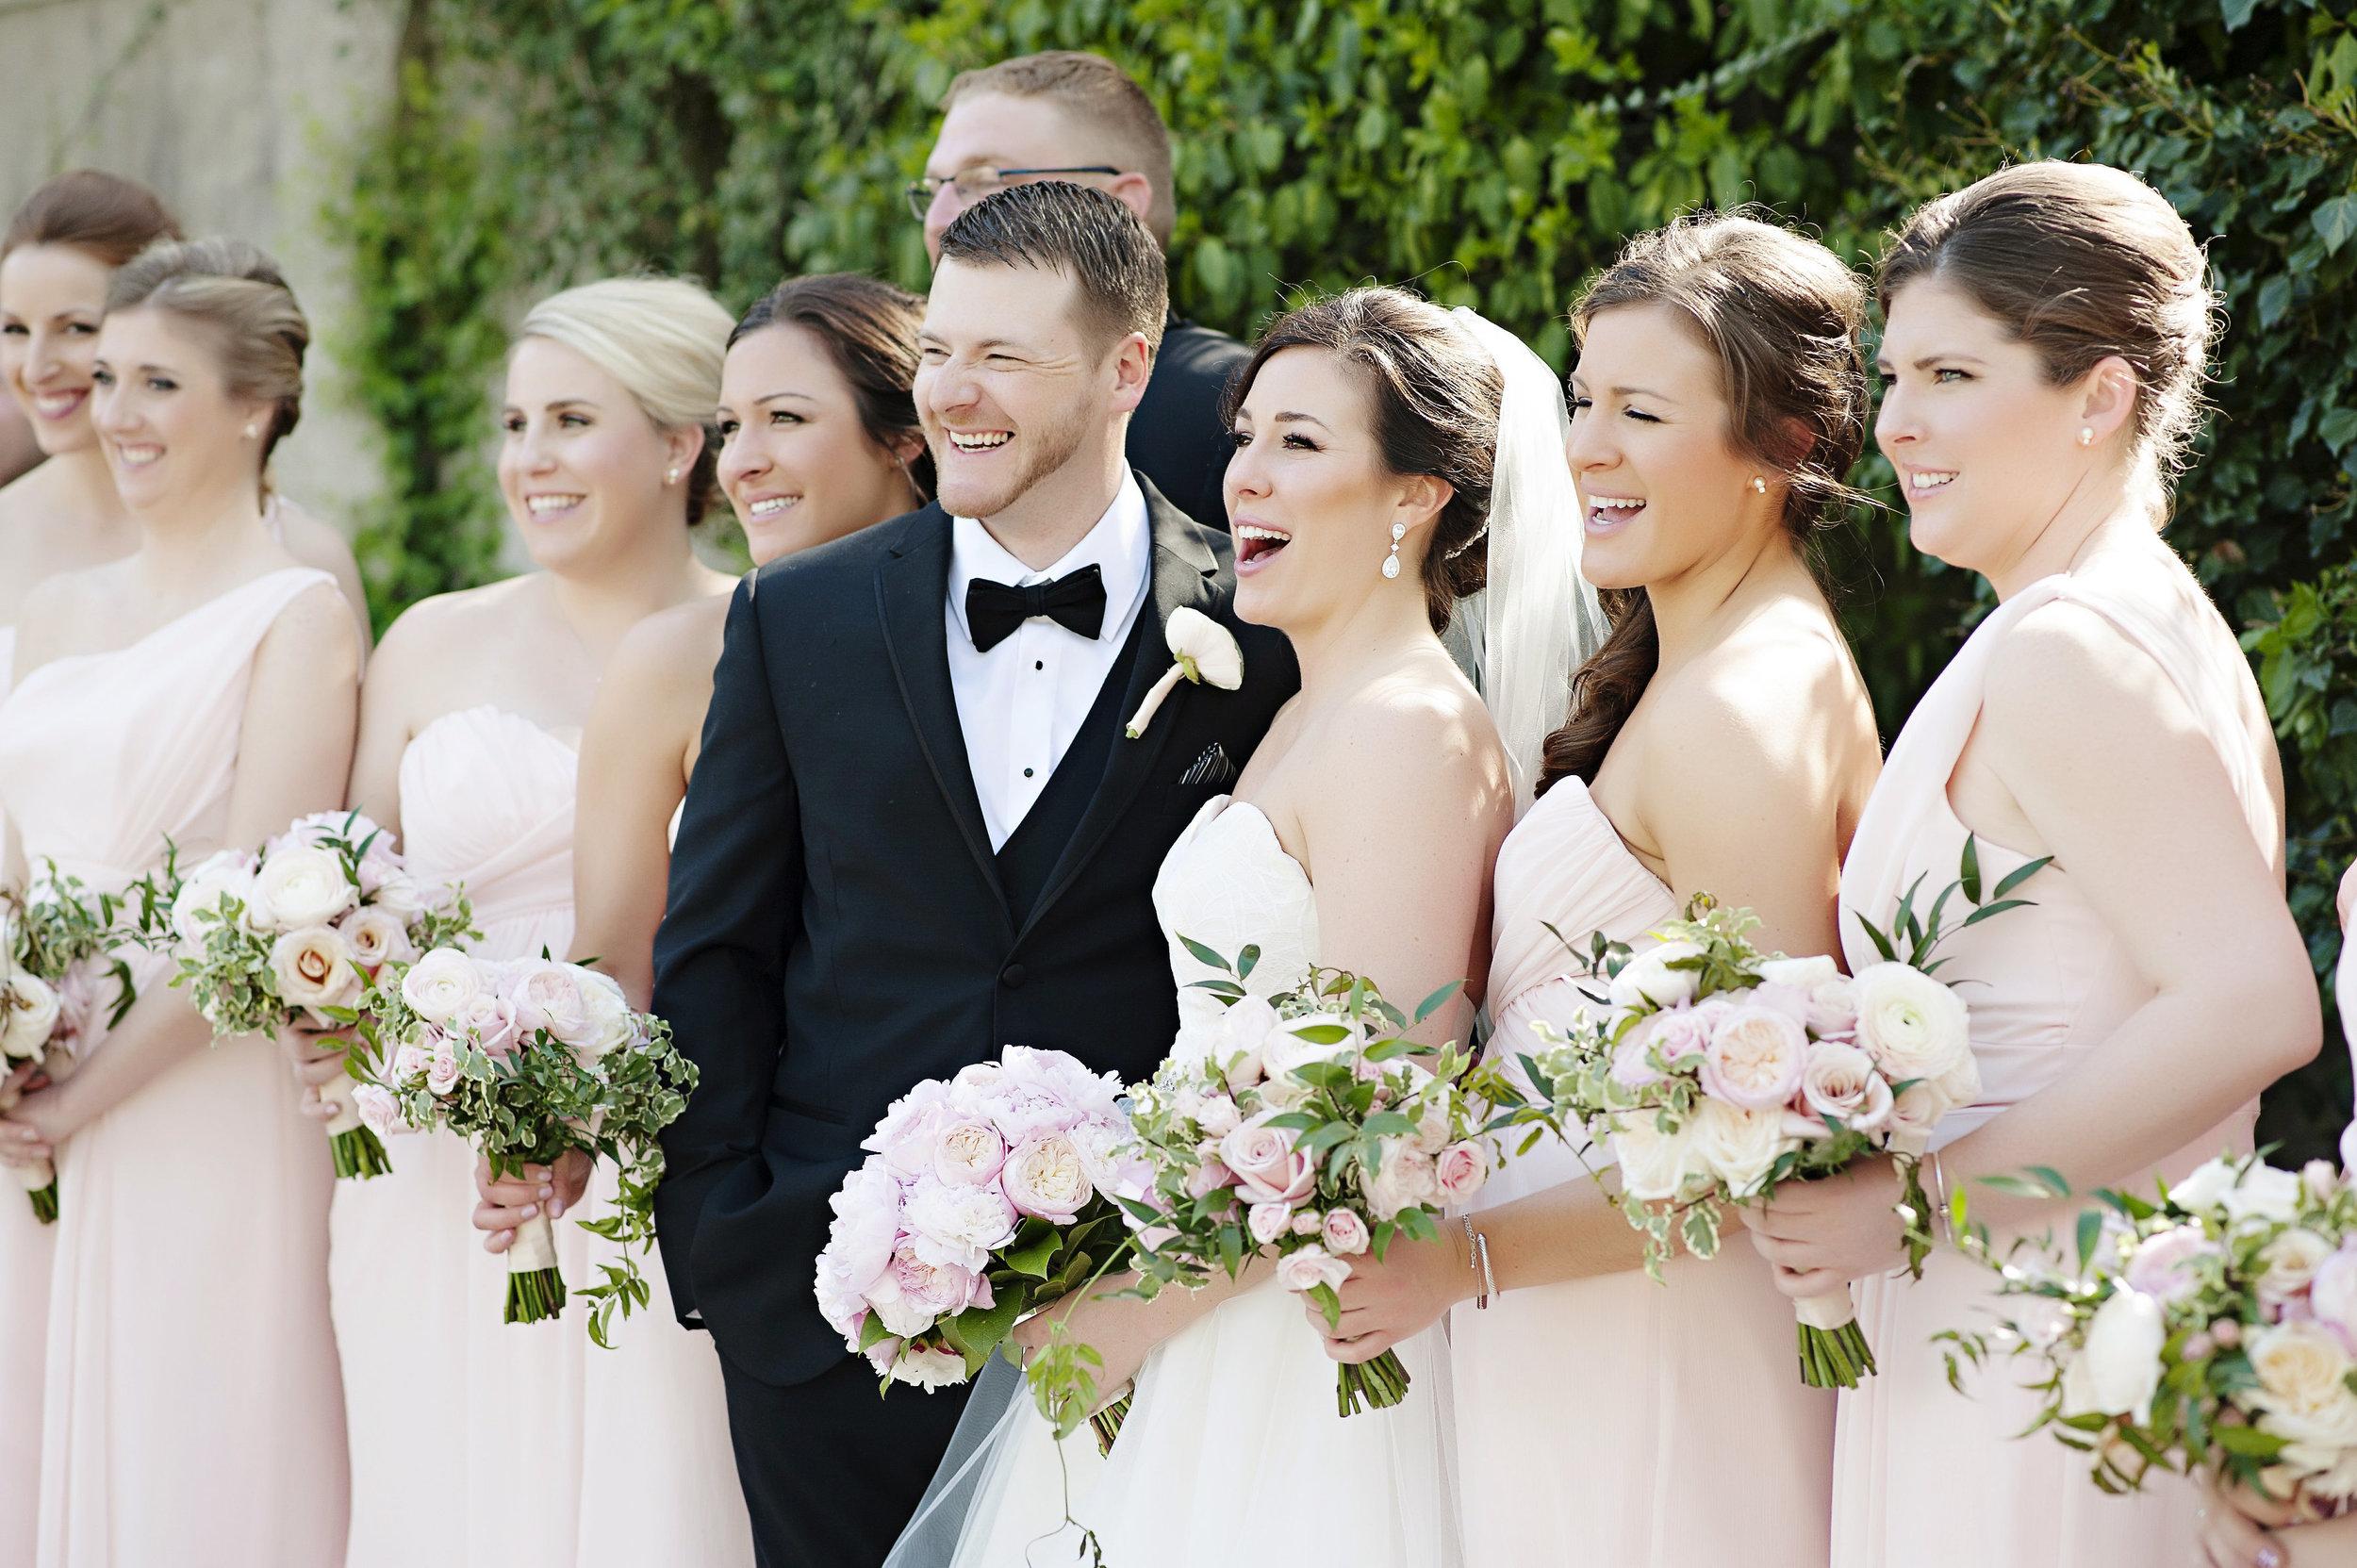 Wedding Party at The Renaissance